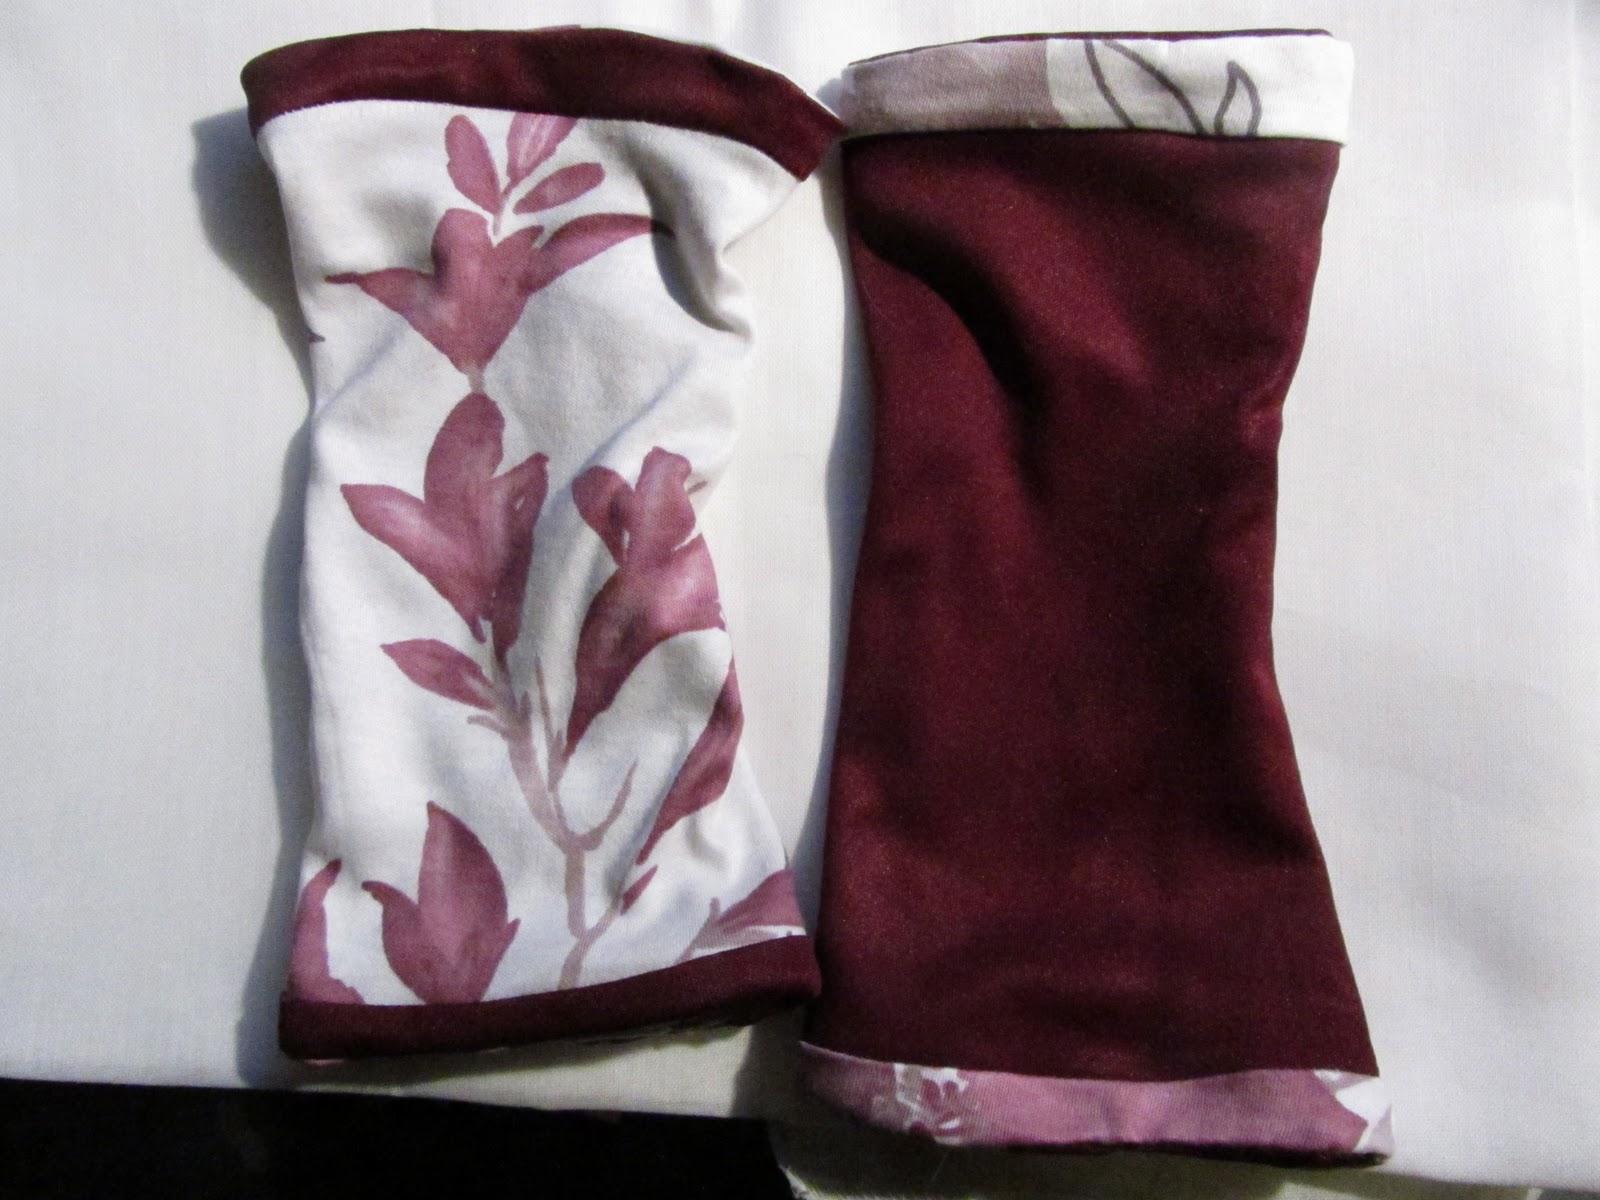 violet 39 s neverwhere weihnachtsn herei last minute geschenke. Black Bedroom Furniture Sets. Home Design Ideas